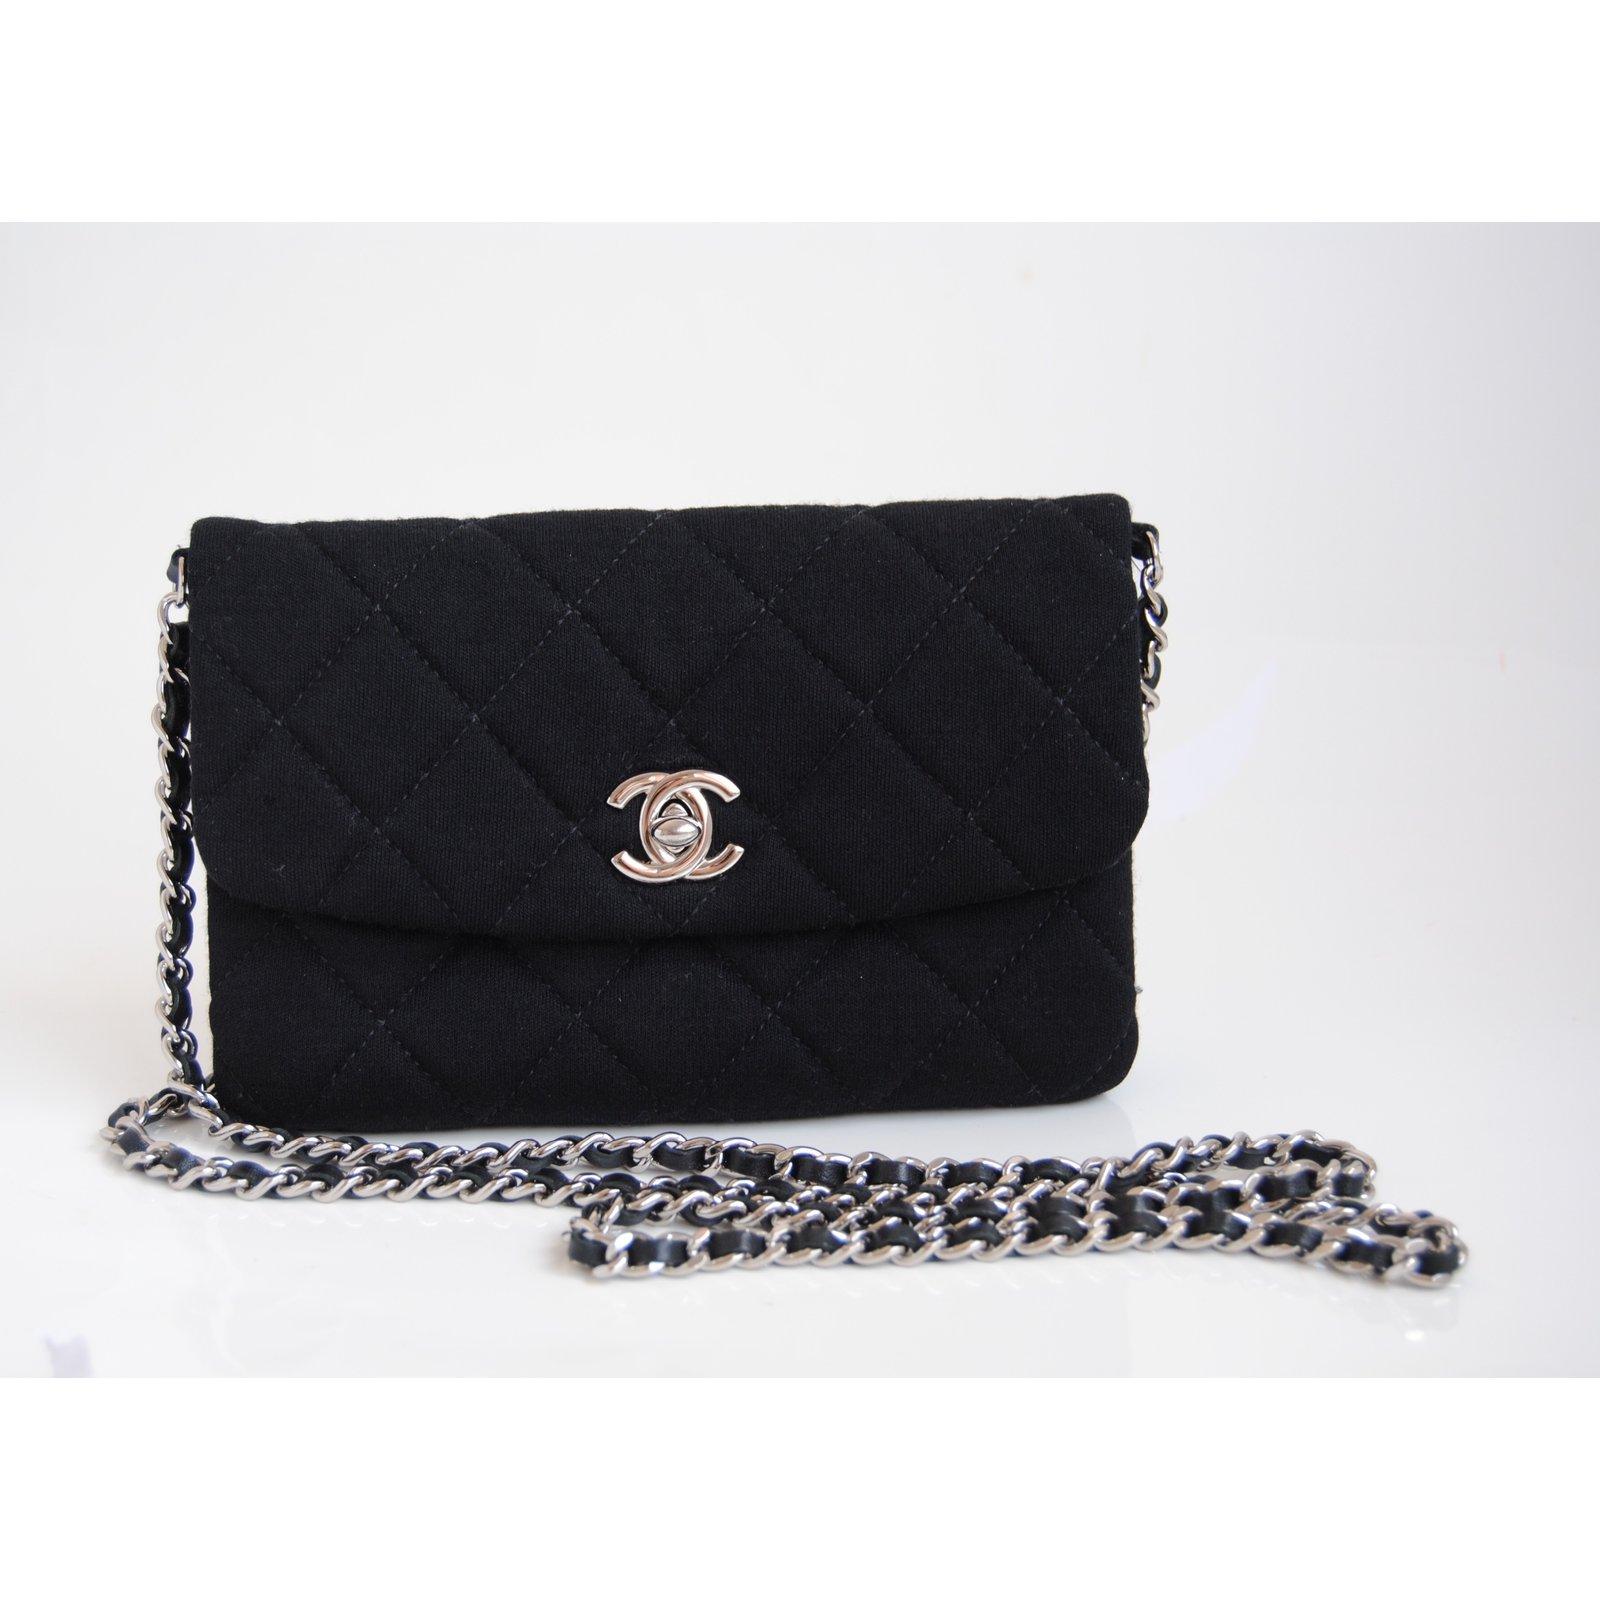 a1271215086 Chanel Timeless flap mini chanel bag Handbags Other Black ref.36690 - Joli  Closet